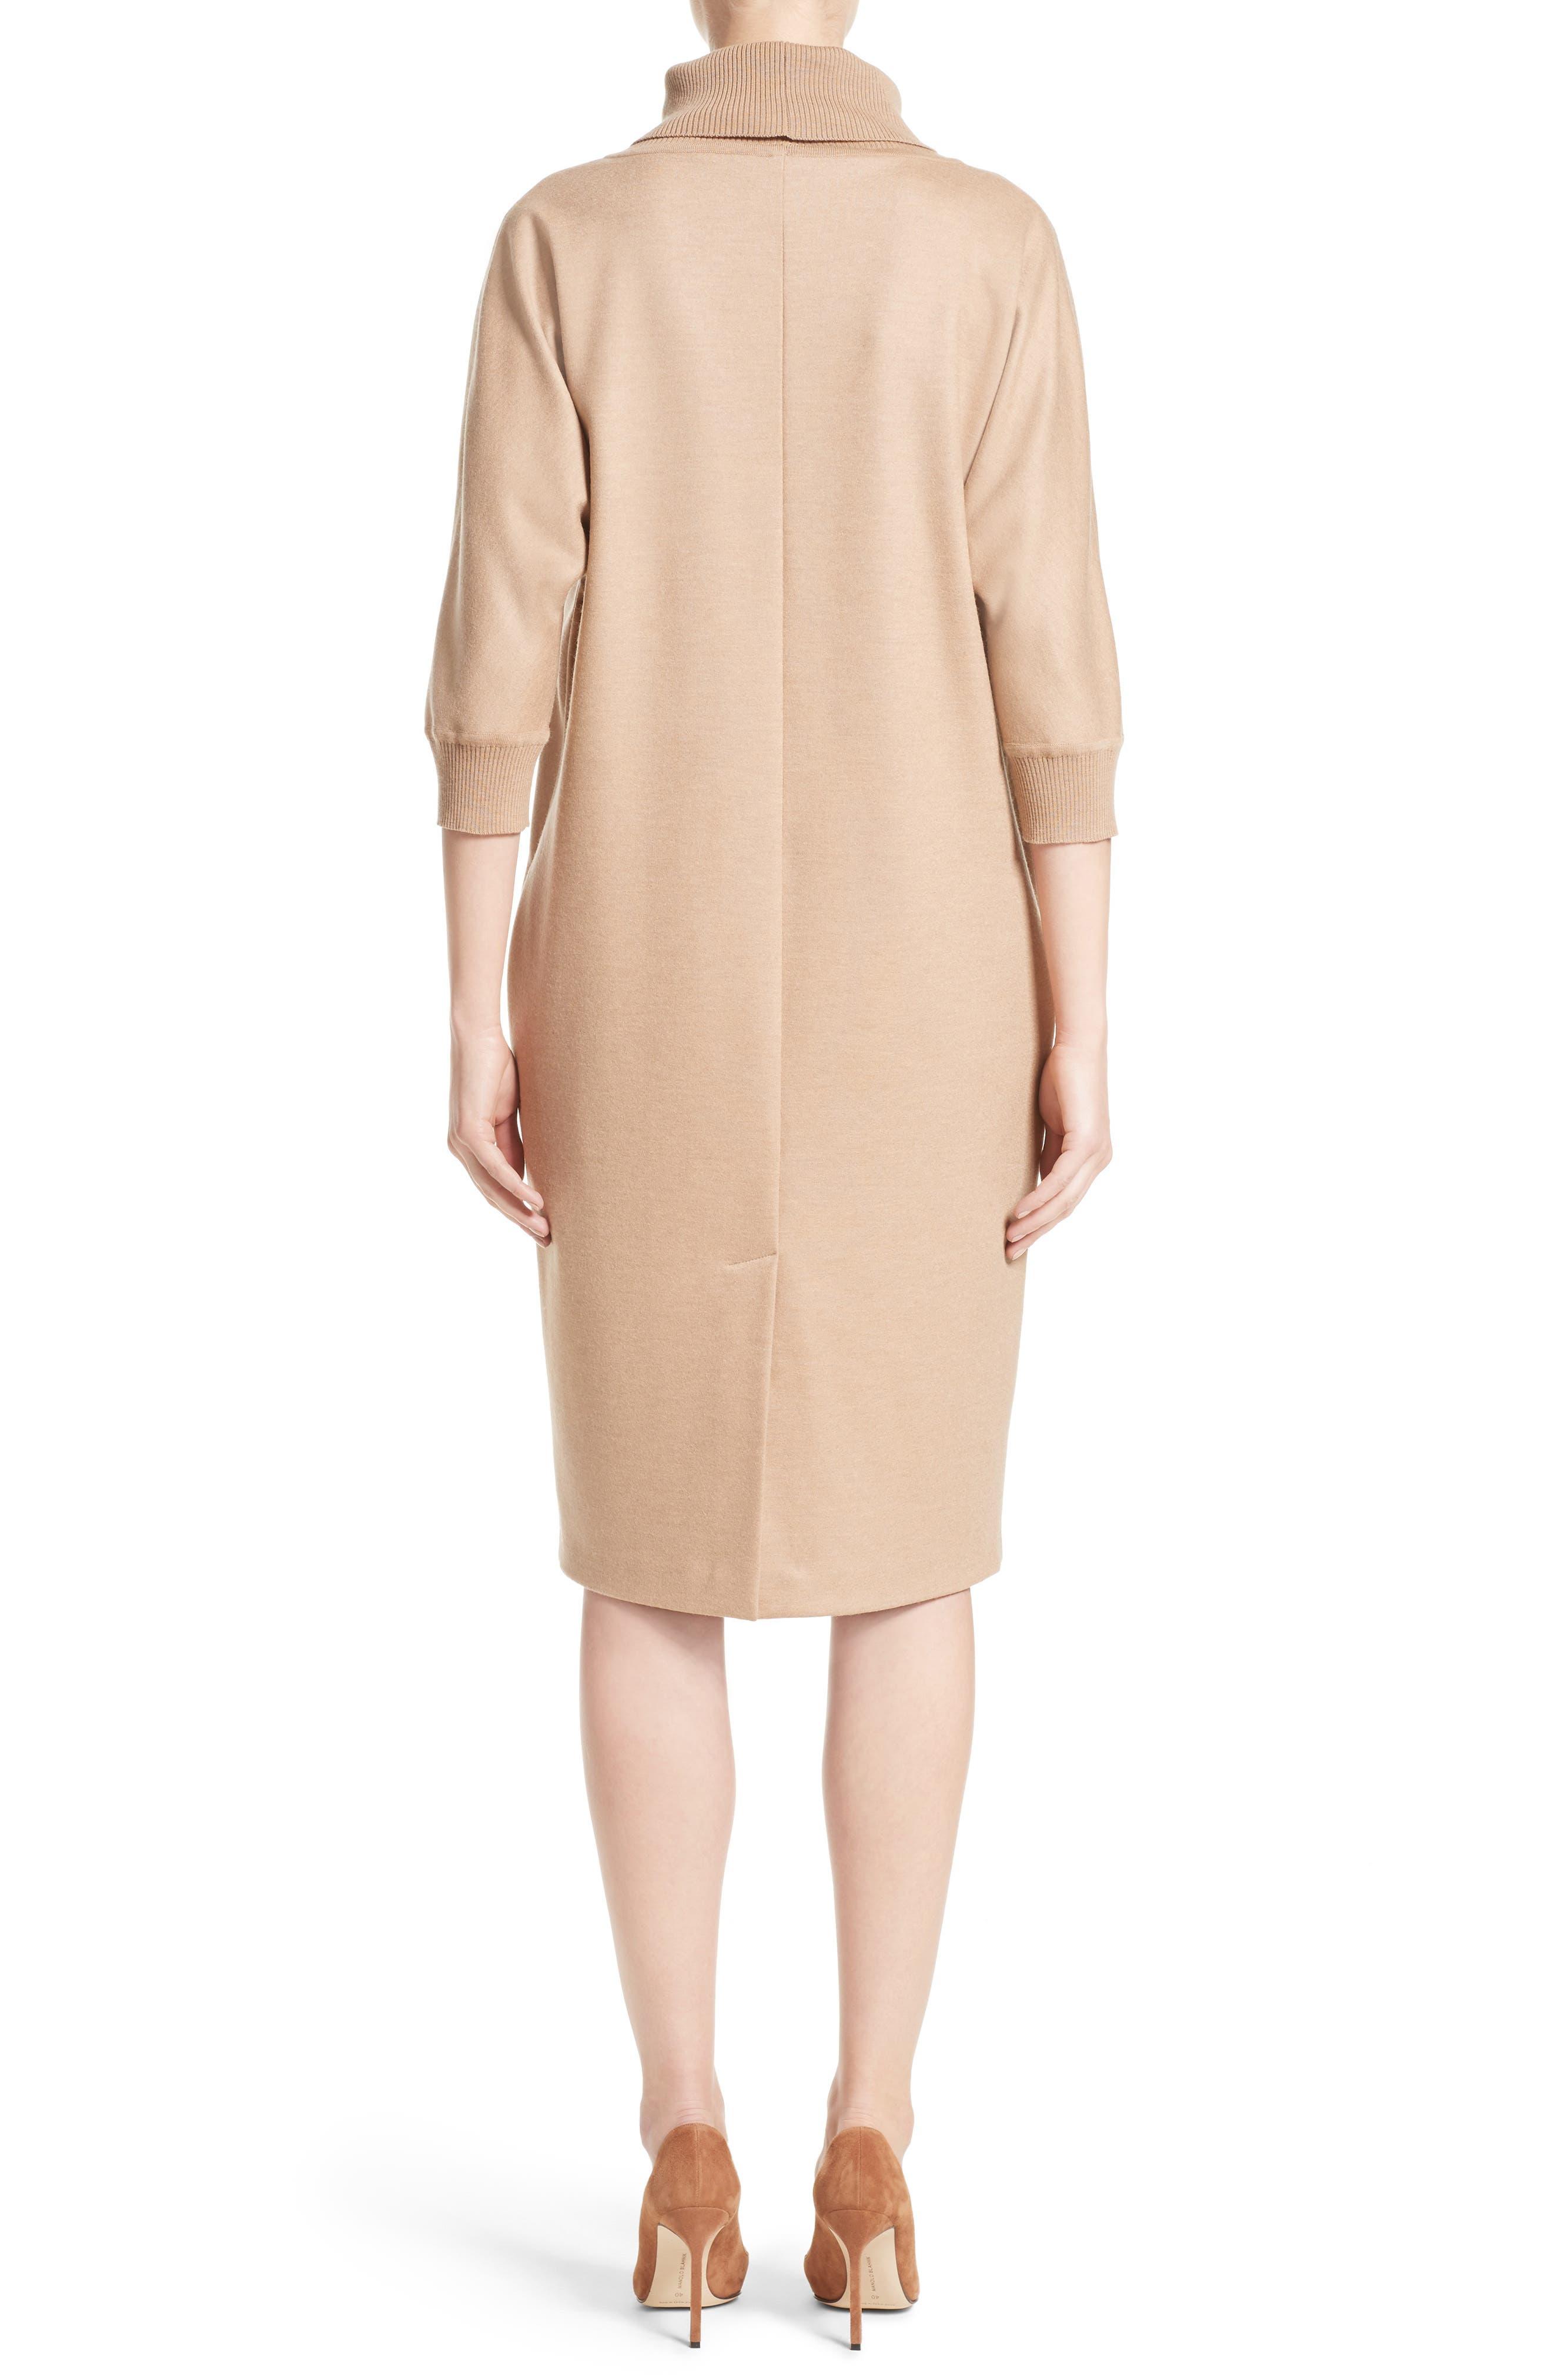 Agro Wool Turtleneck Dress,                             Alternate thumbnail 2, color,                             232